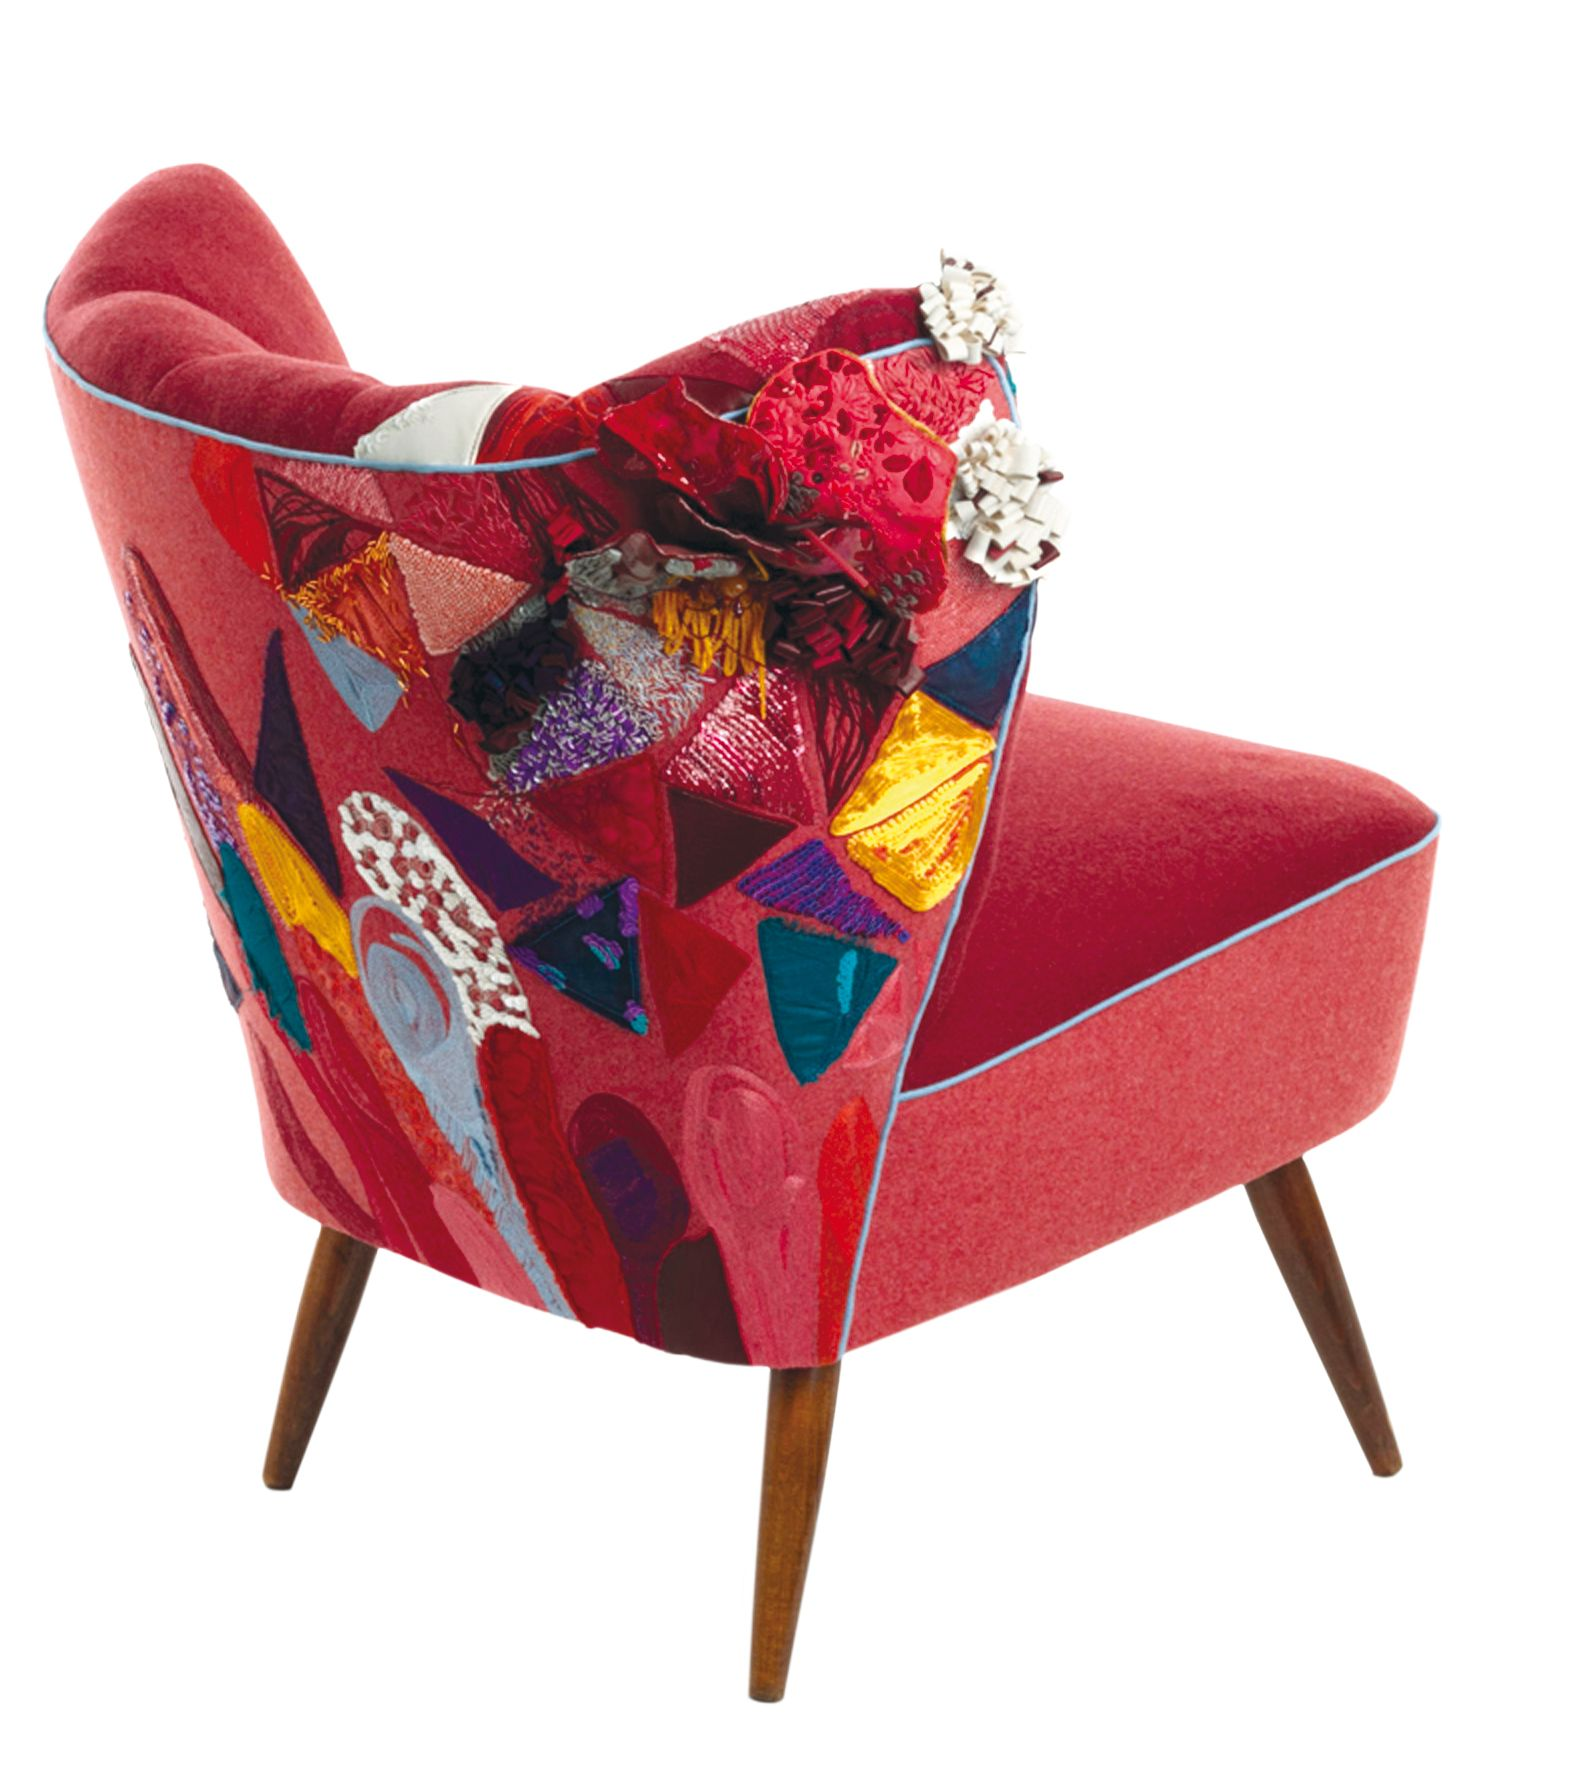 fauteuil vintage l atelier du renard broderie en ameublement magali renard like it pinterest. Black Bedroom Furniture Sets. Home Design Ideas